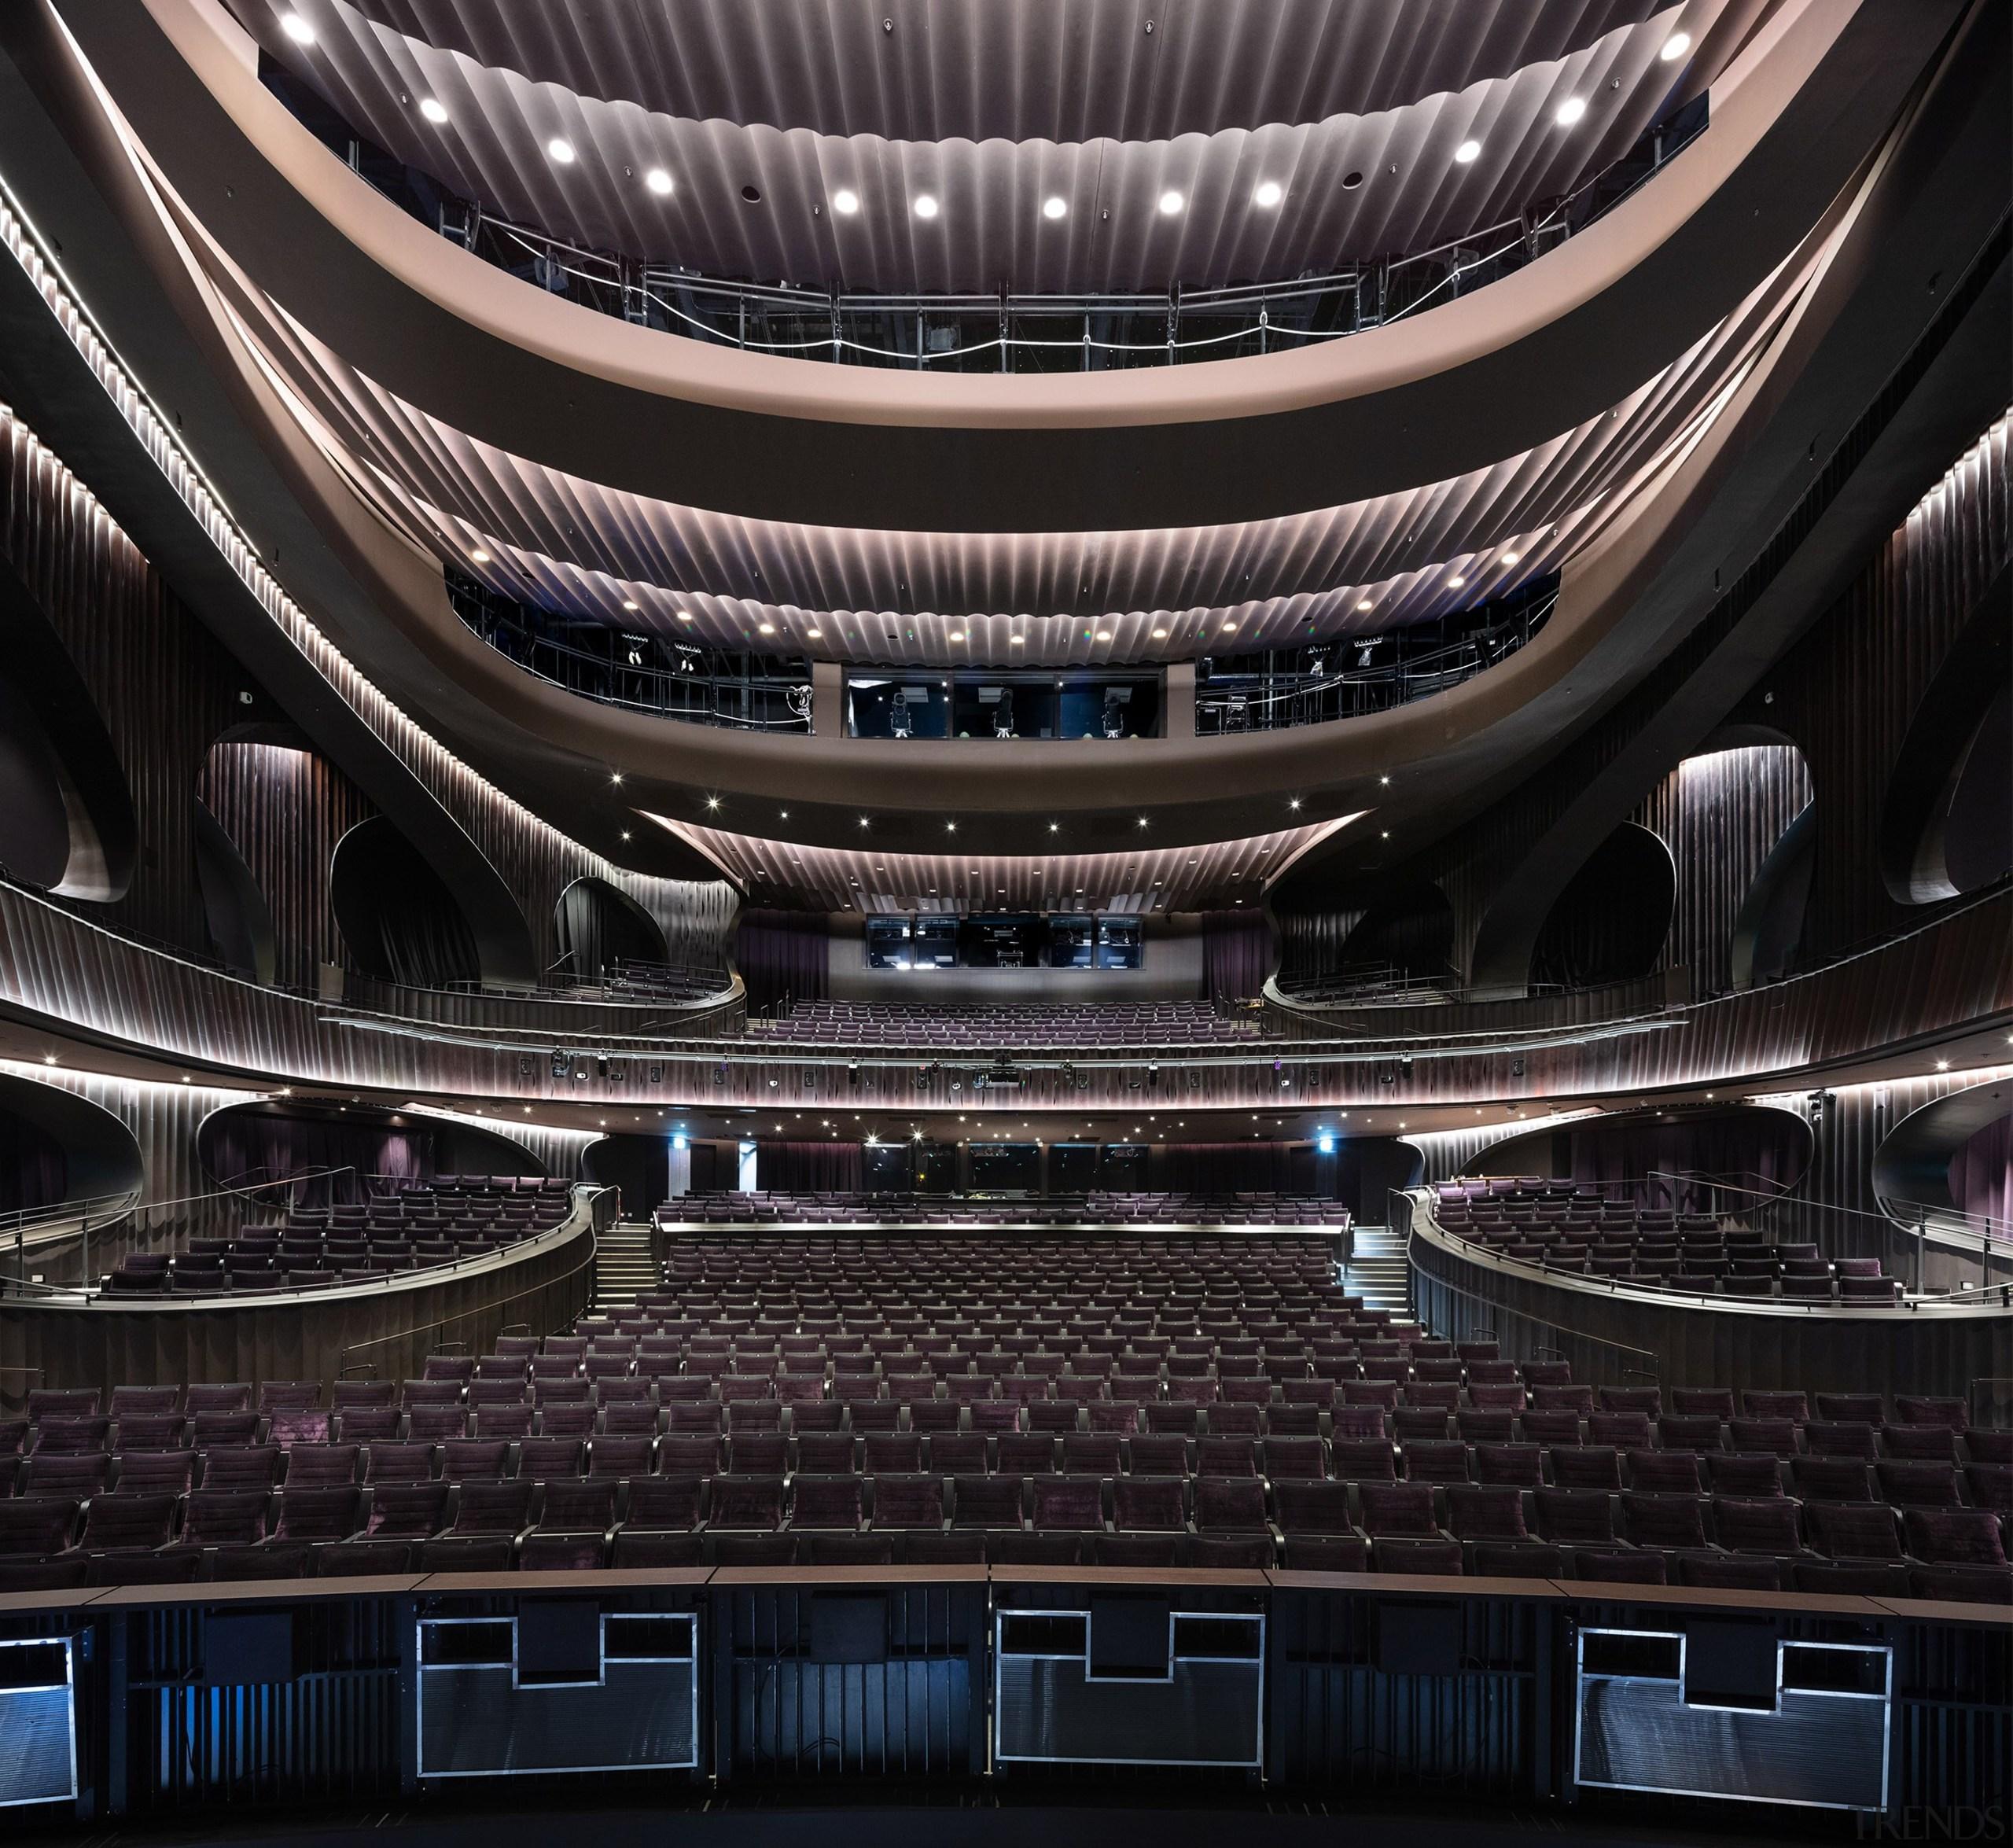 Xiqu Centre's breathtaking 1,073-seat Grand Theatre. architecture, automotive design, automotive exterior, building, ceiling, metal, opera house, performing arts center, stage, black